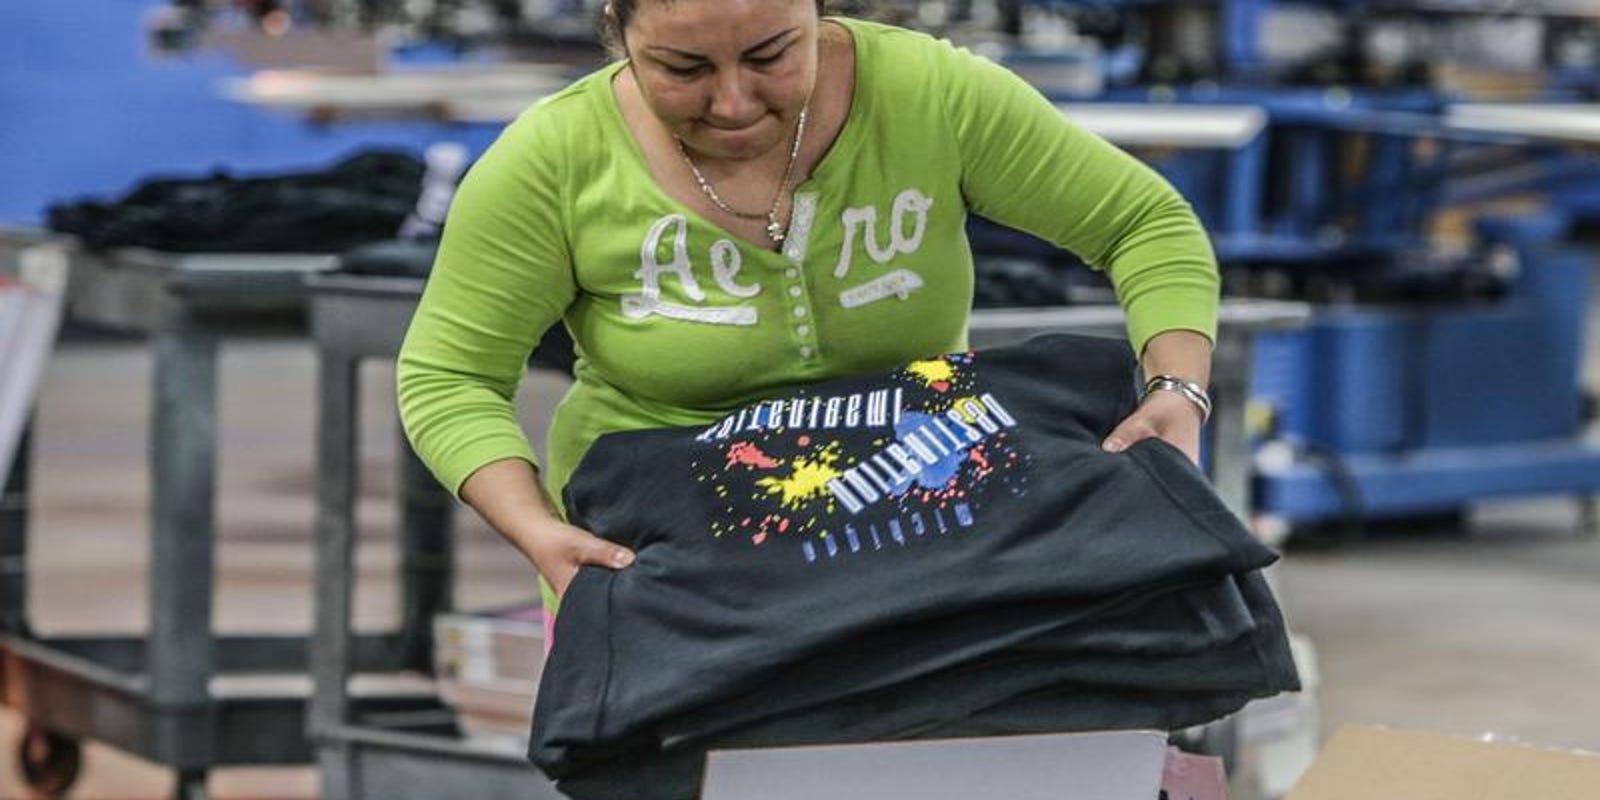 T-shirt printer ooShirts goes digital in a big way